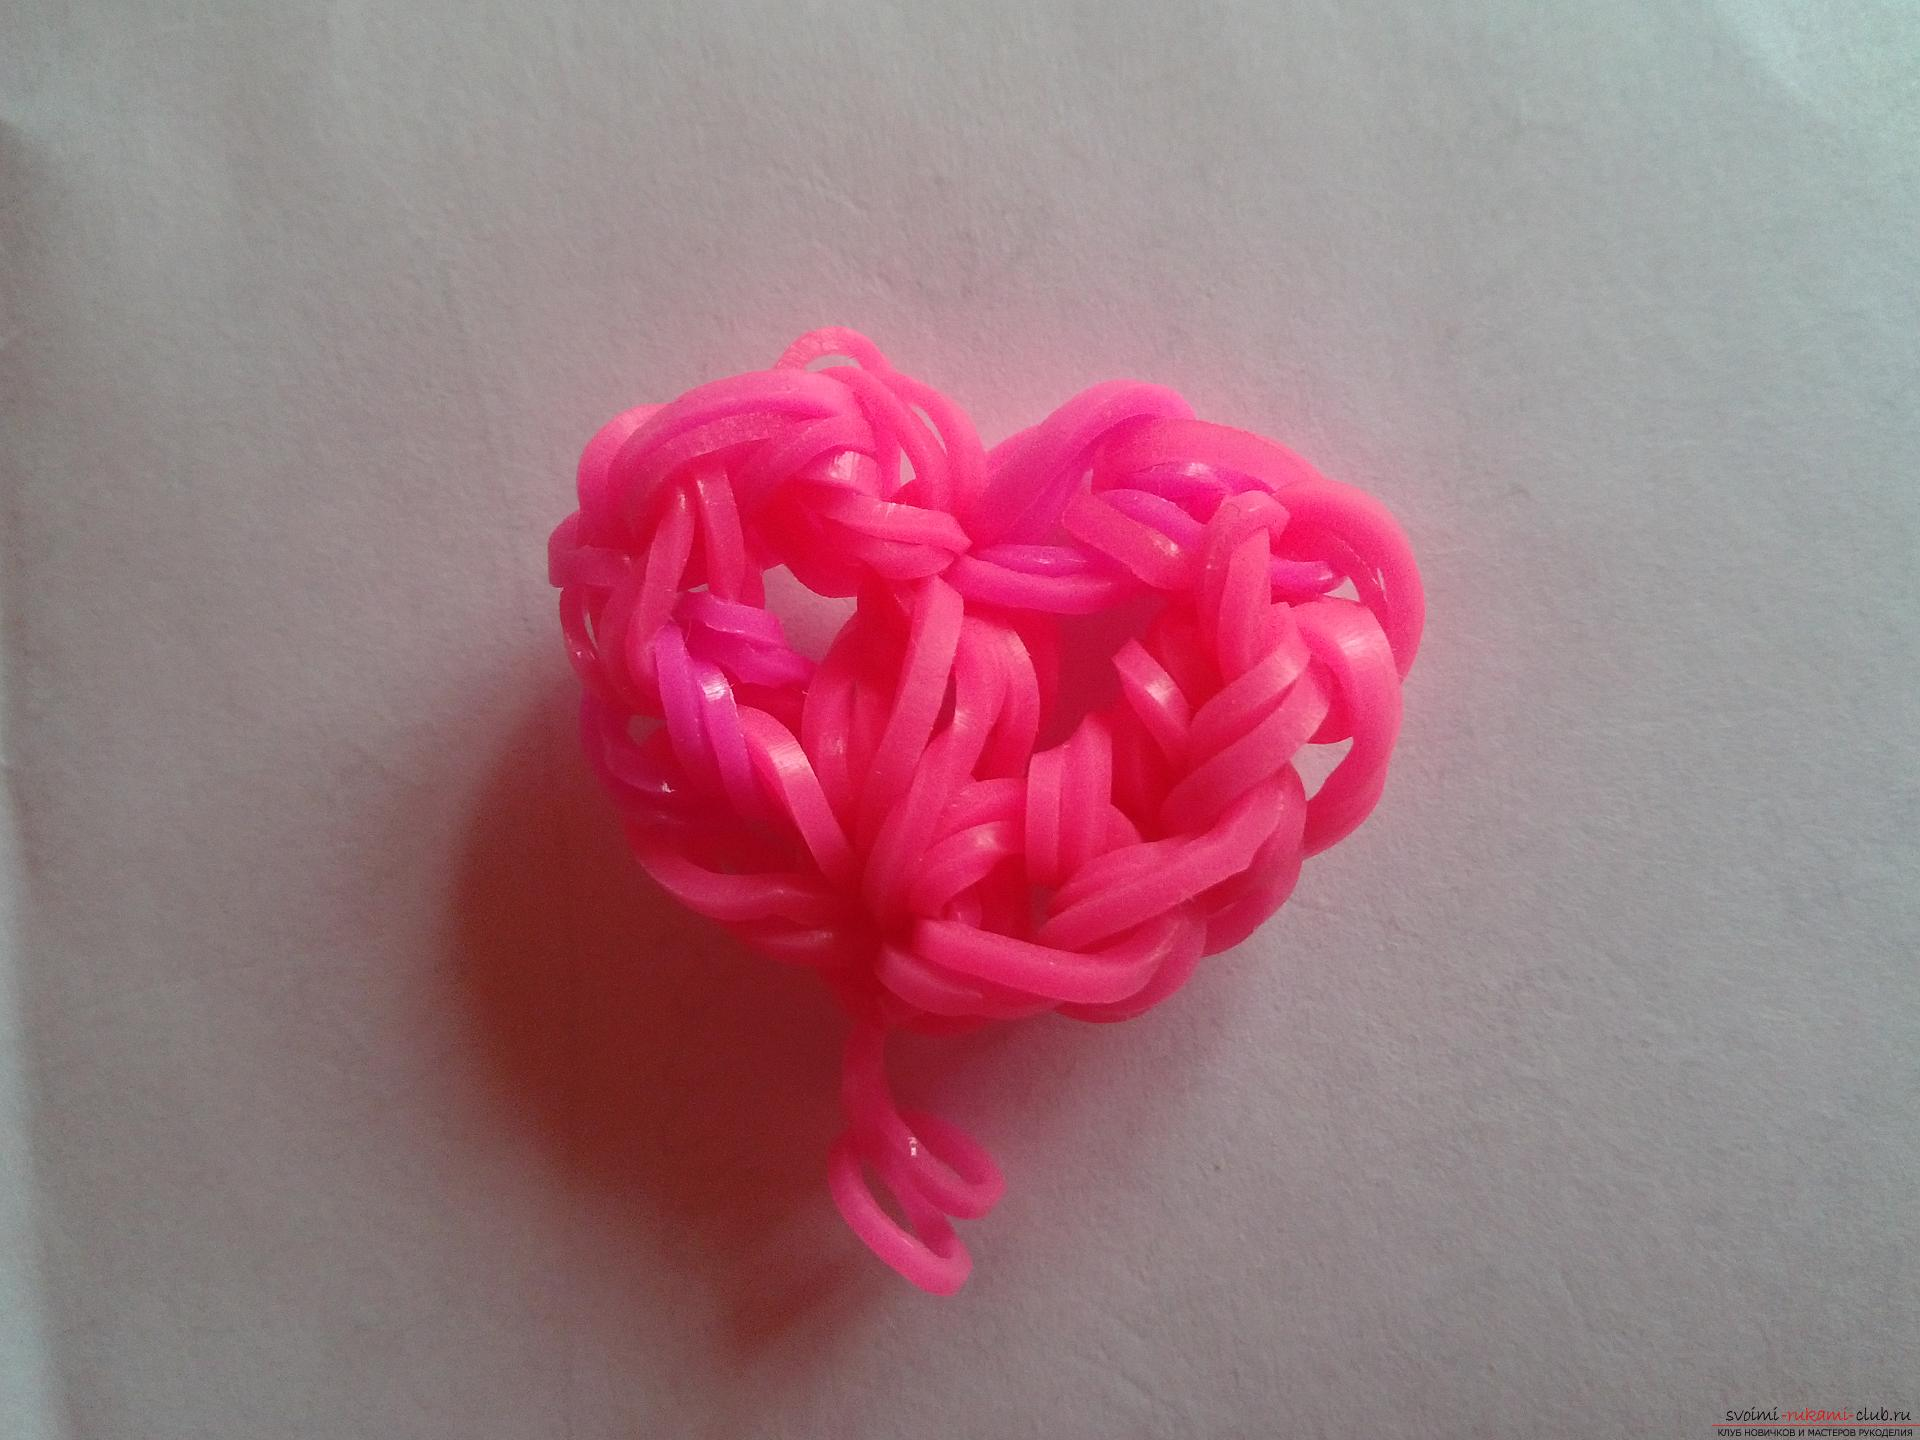 Как плести сердечко из резиночек